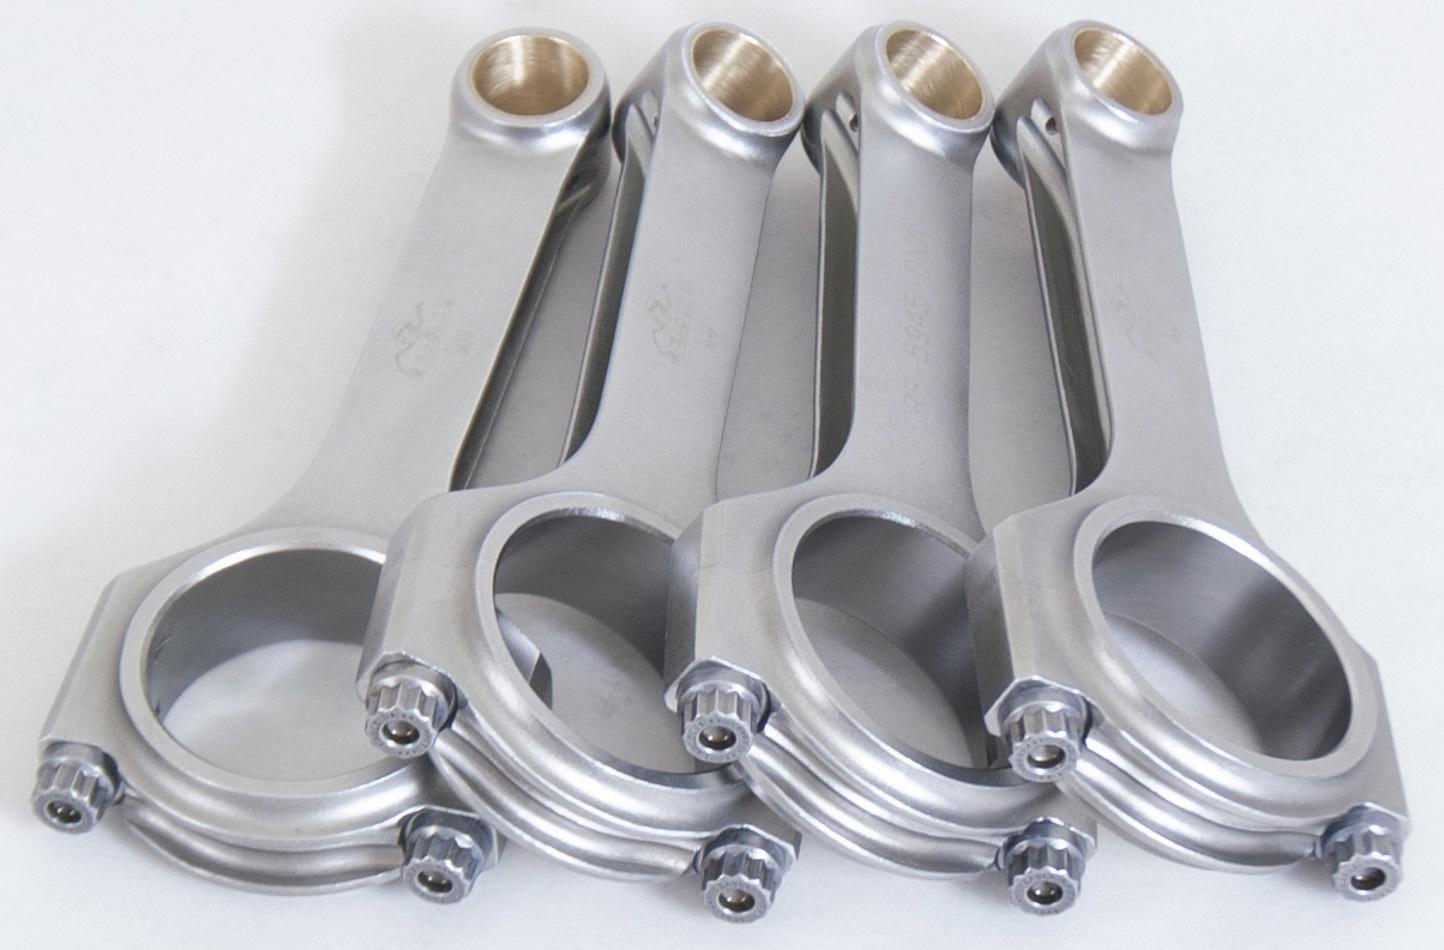 Mopar 2.4L SRT4 4340 Forged H-Beam Rods 5.945